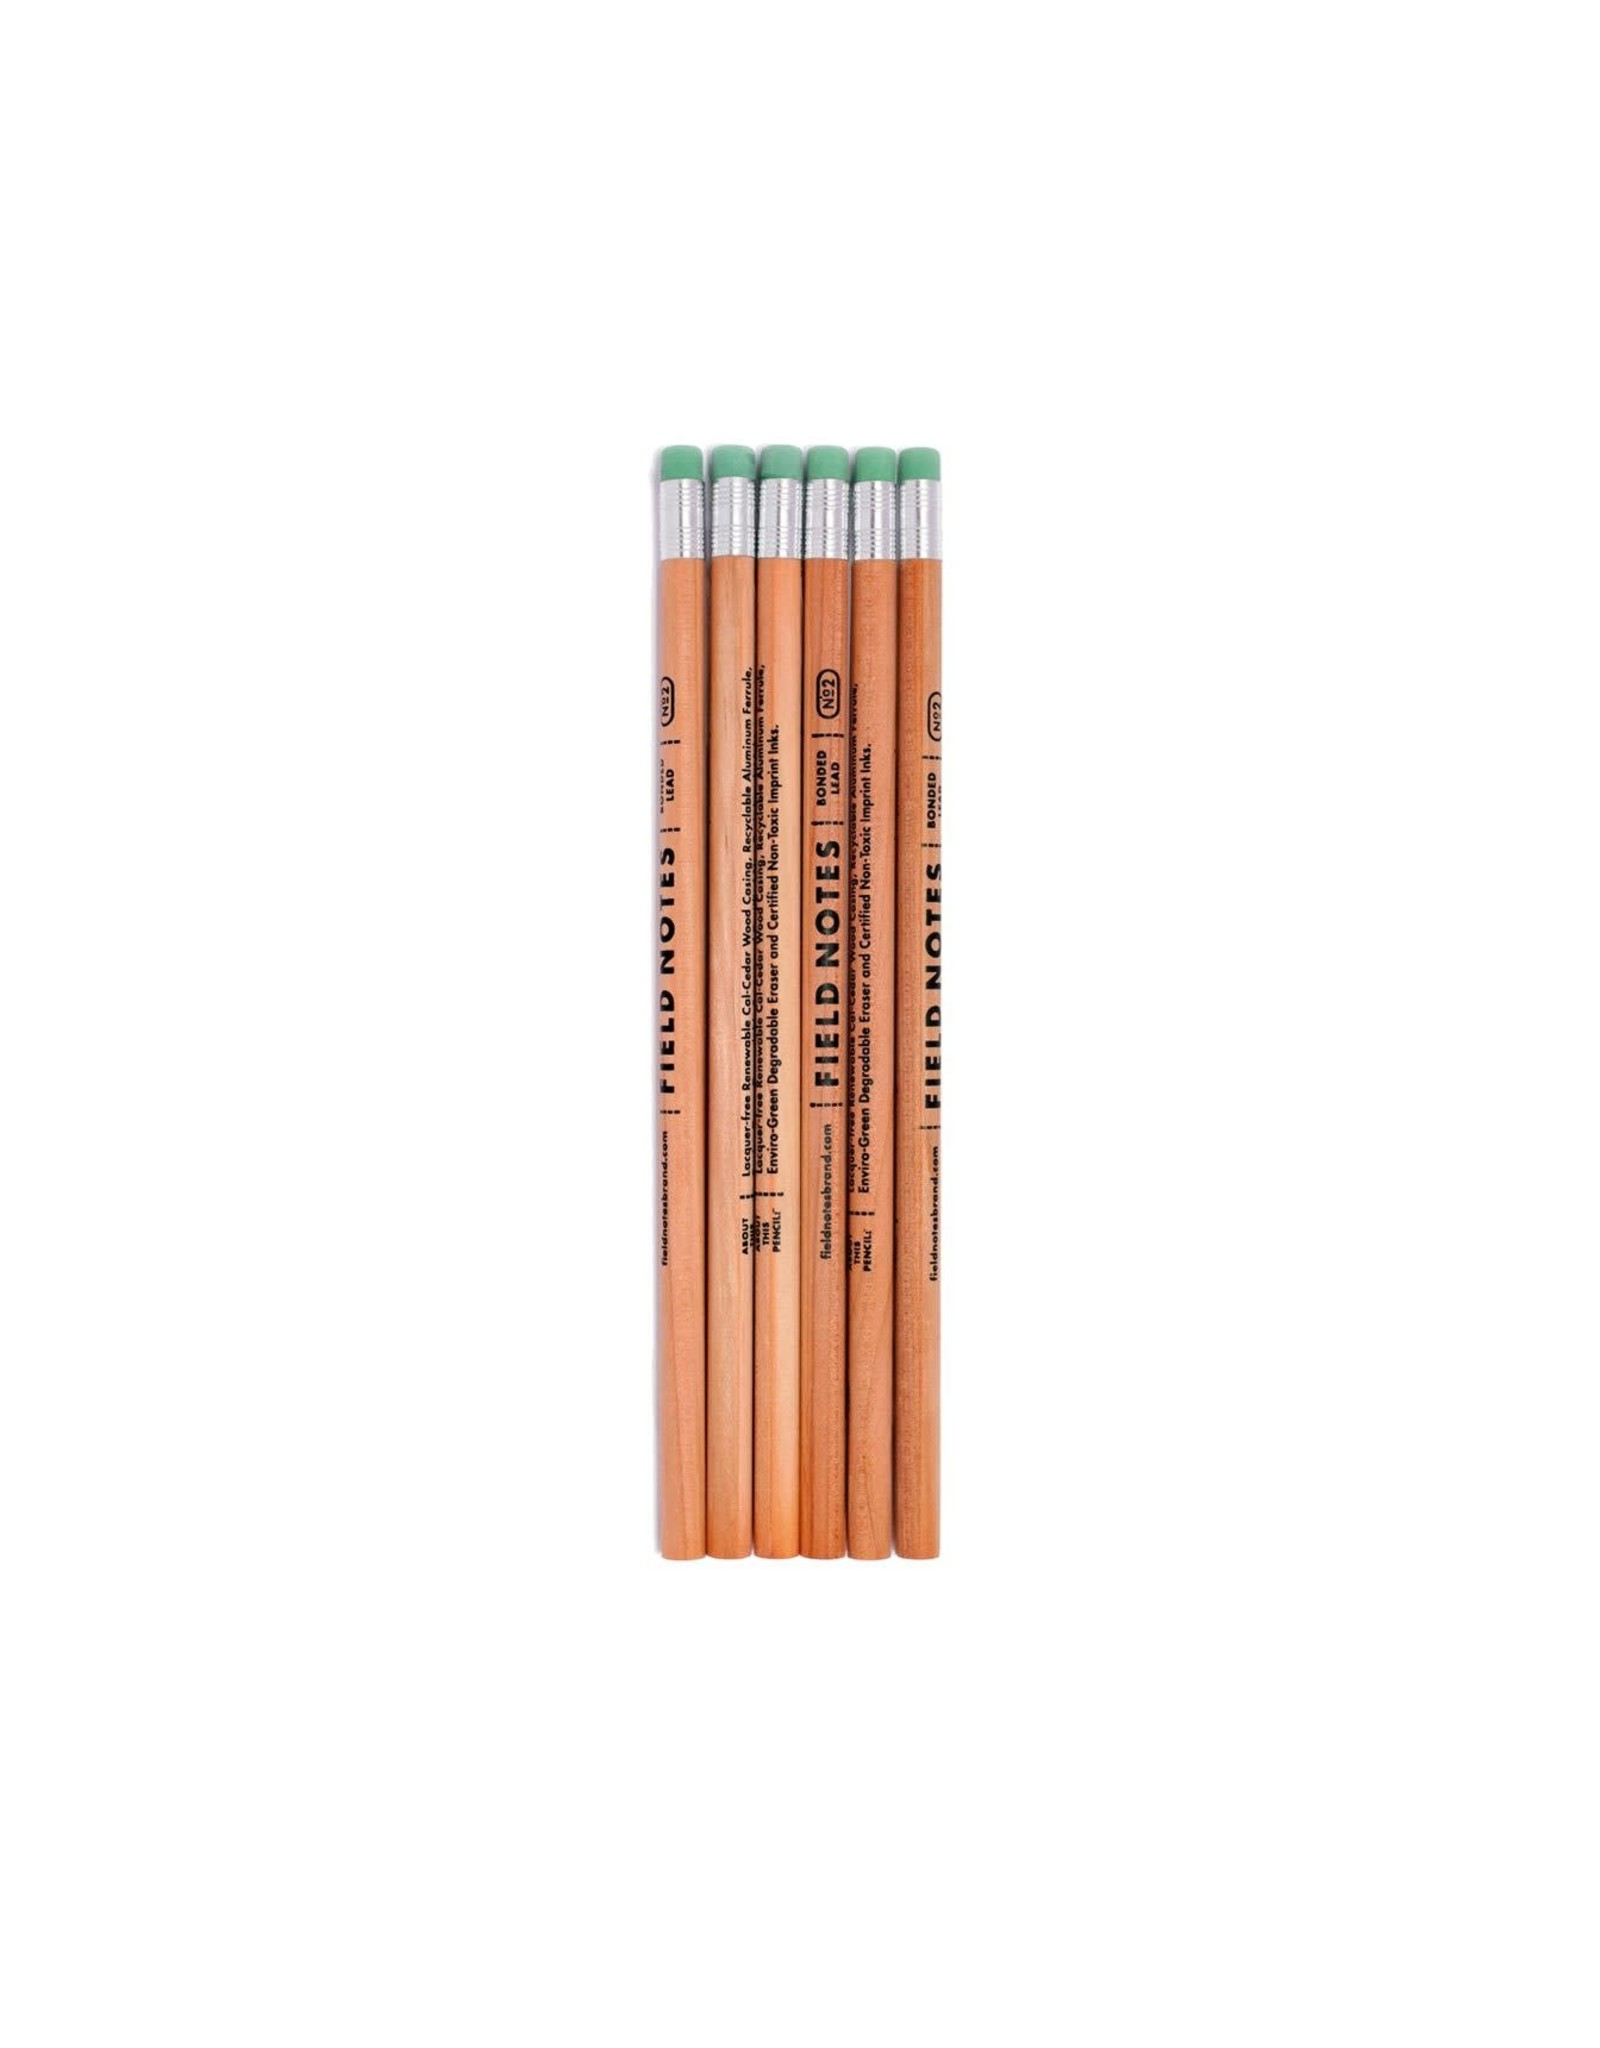 Field Notes Woodgrain Pencil 6 Pack